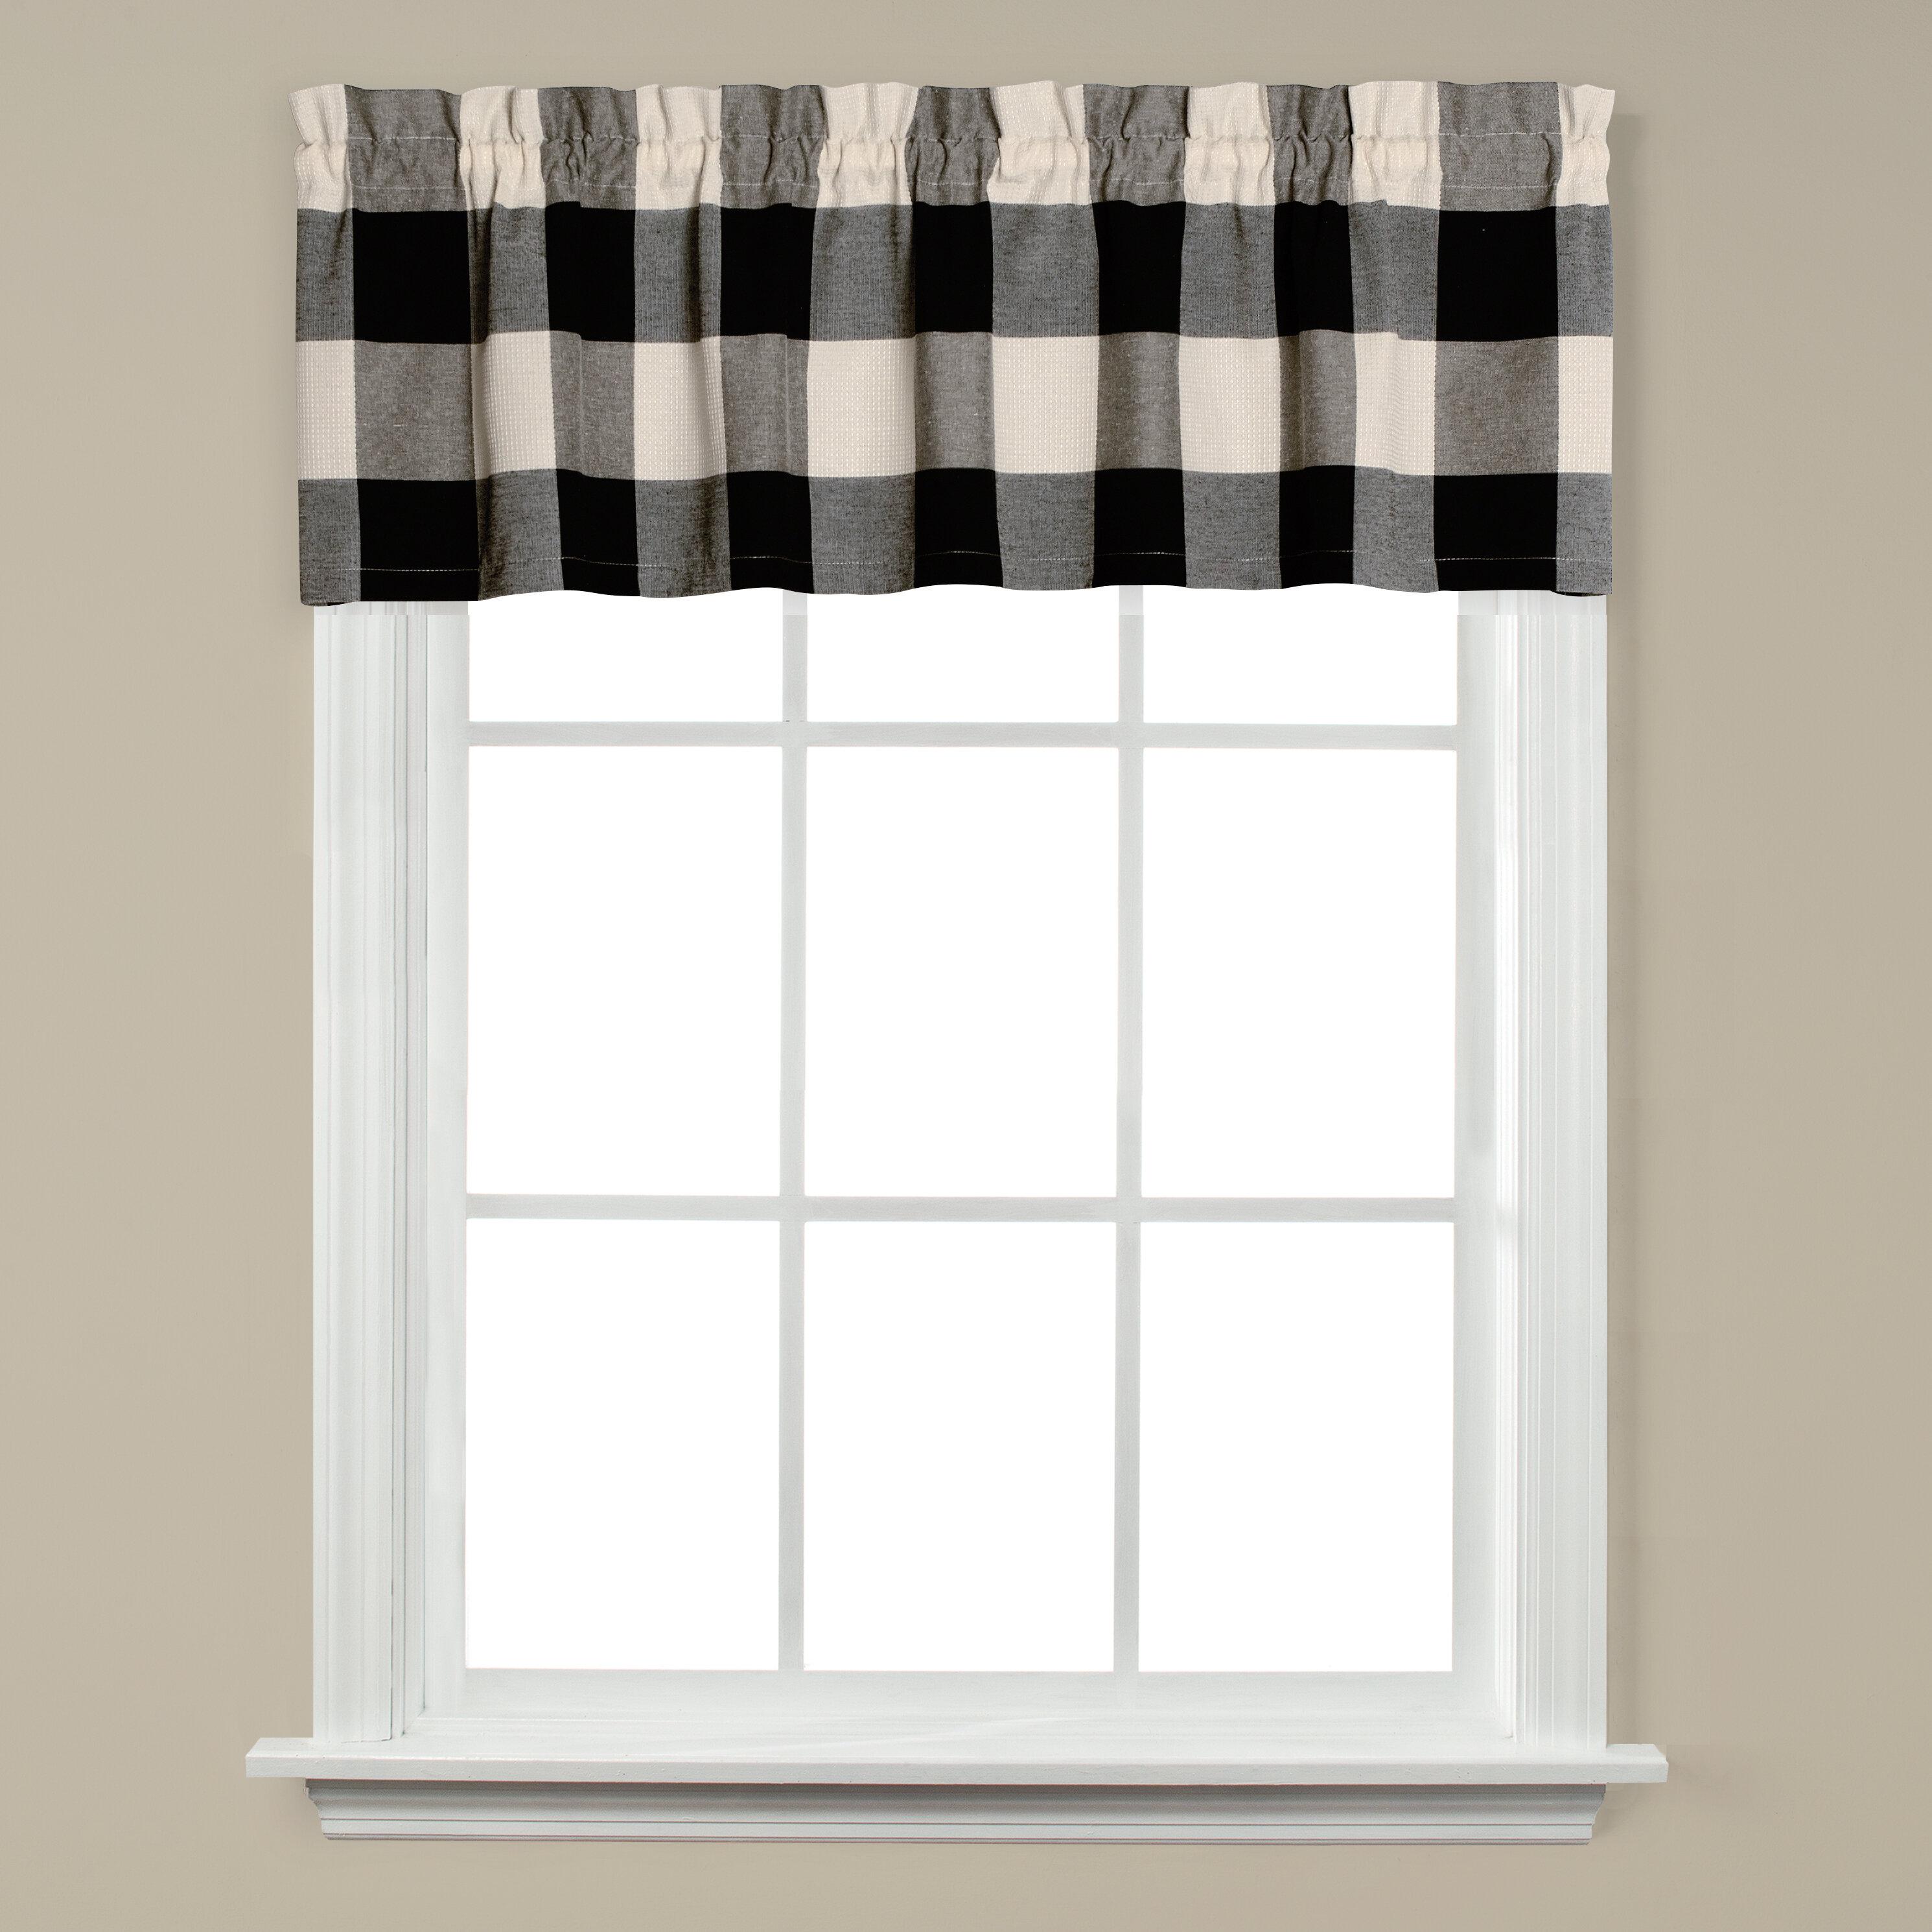 Modern Farmhouse Window Pane White and Black Curtain Valance